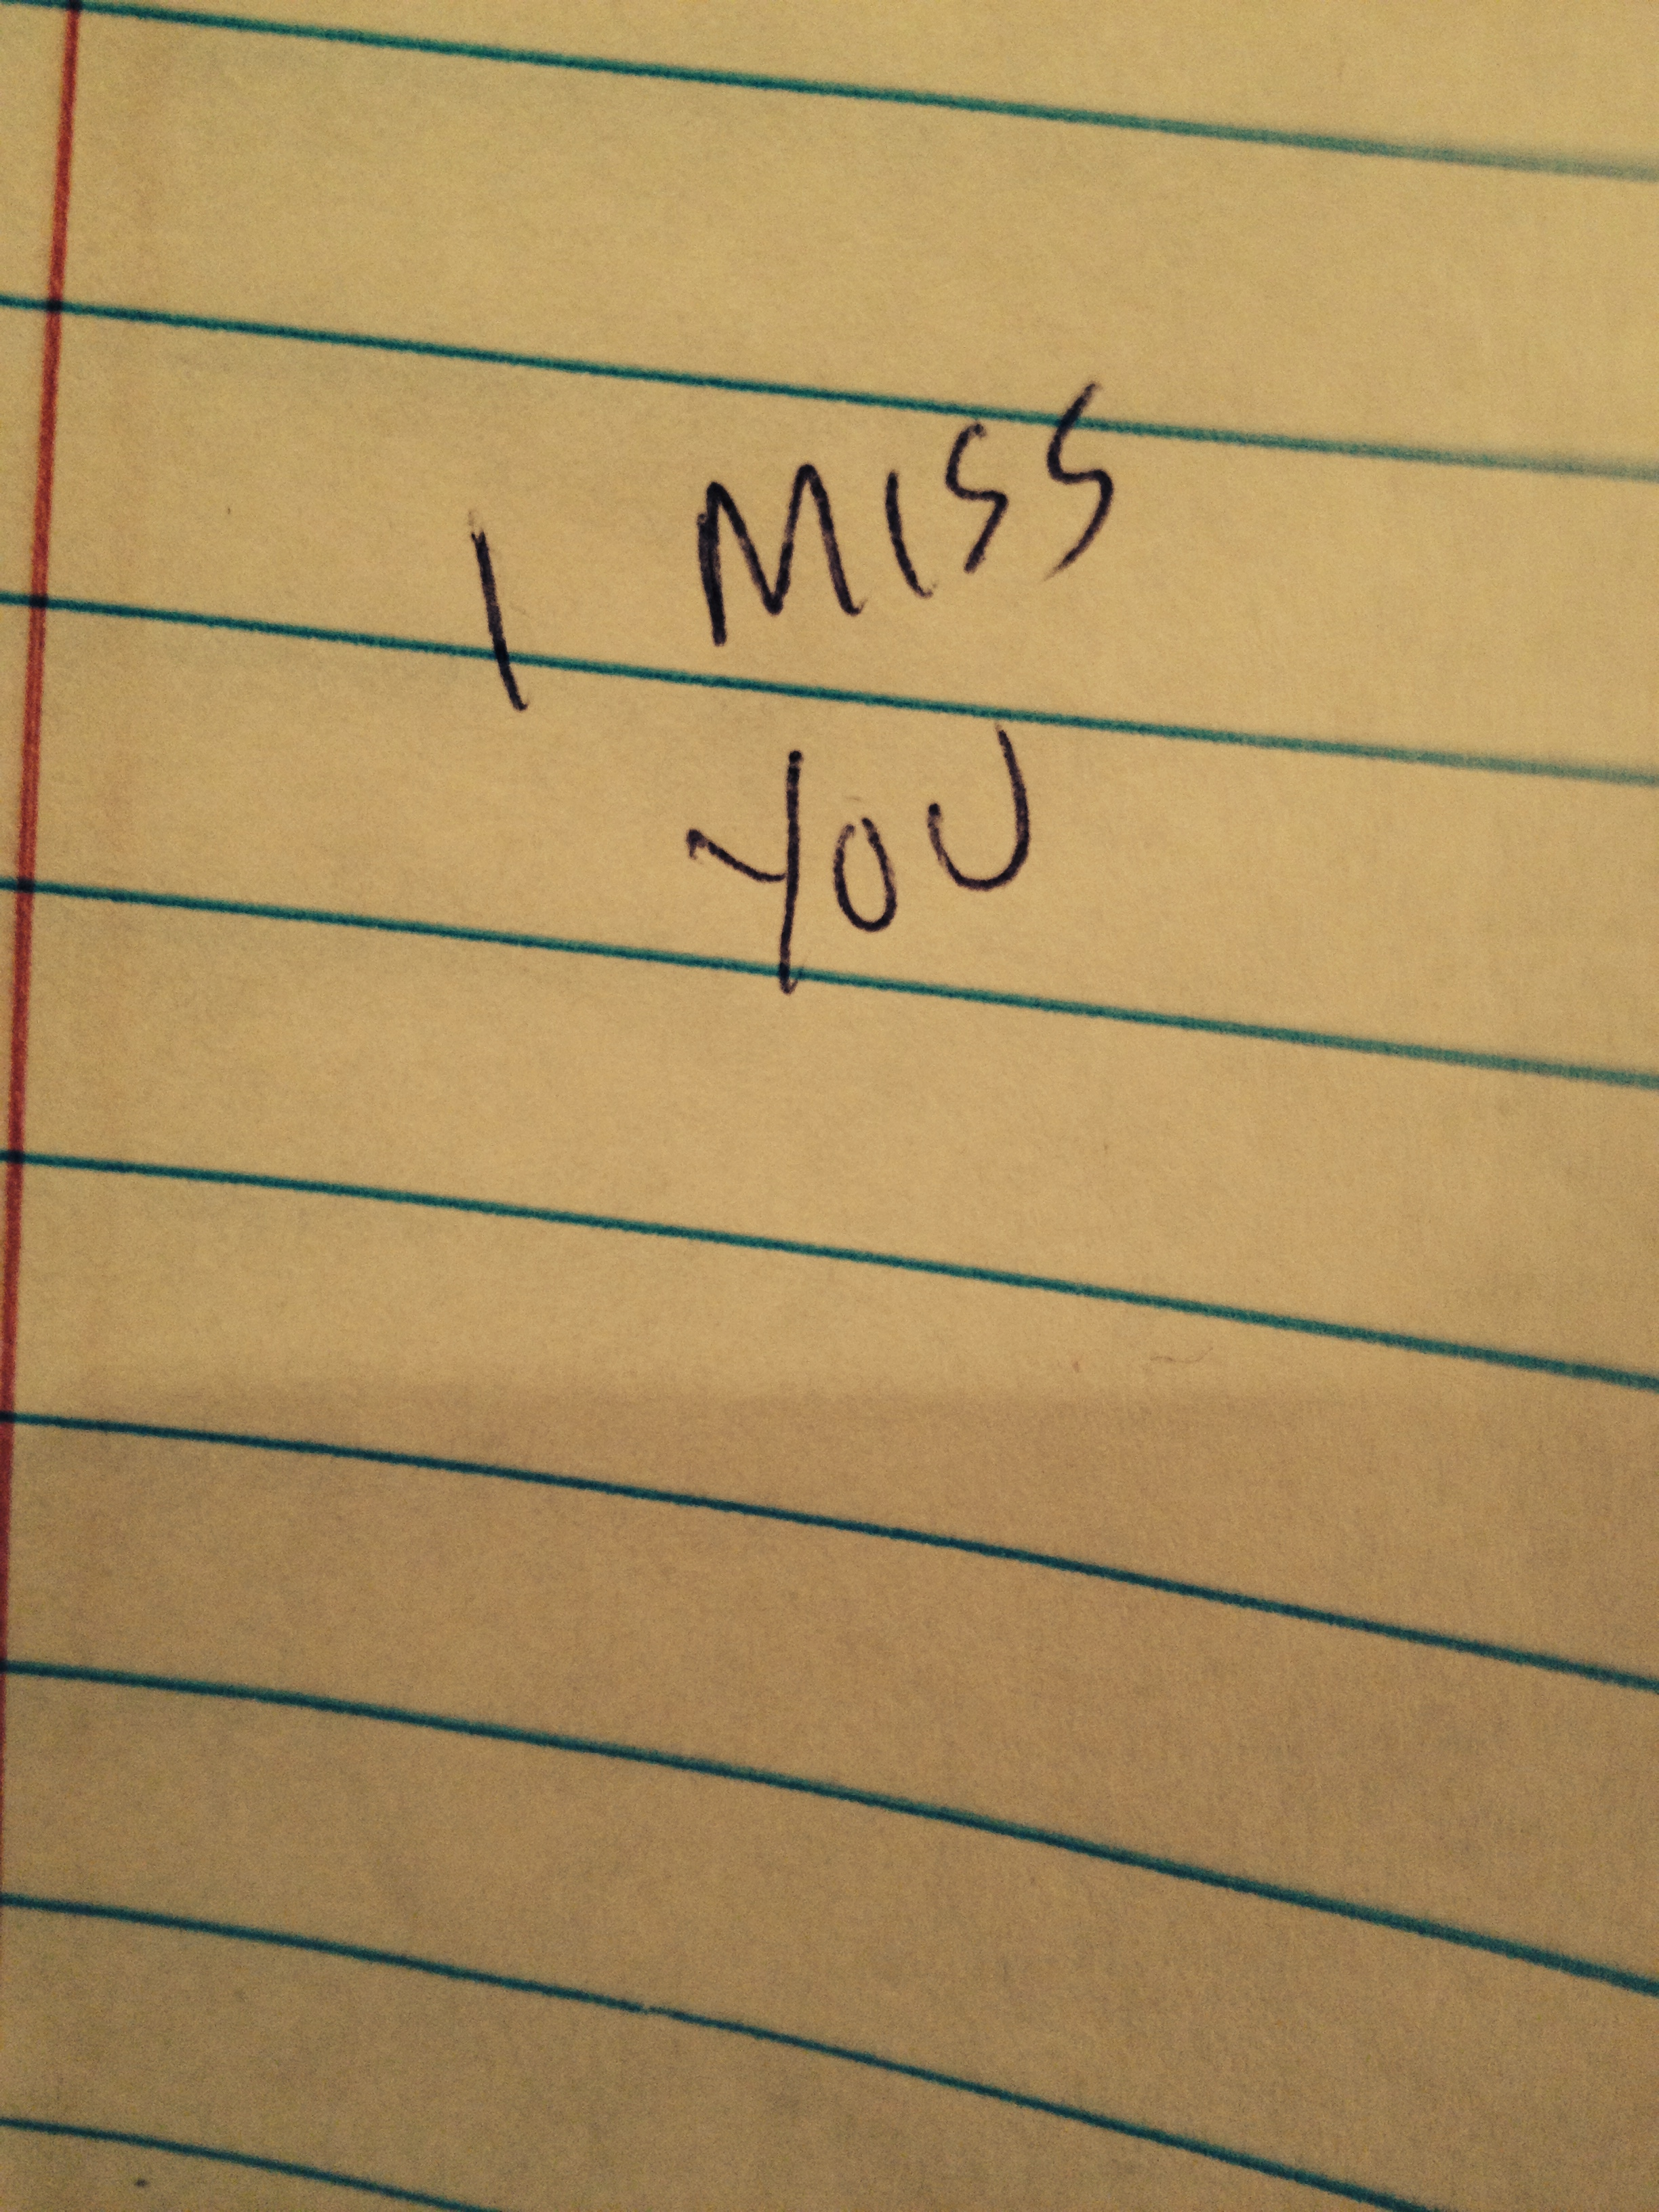 I Miss You (2013)